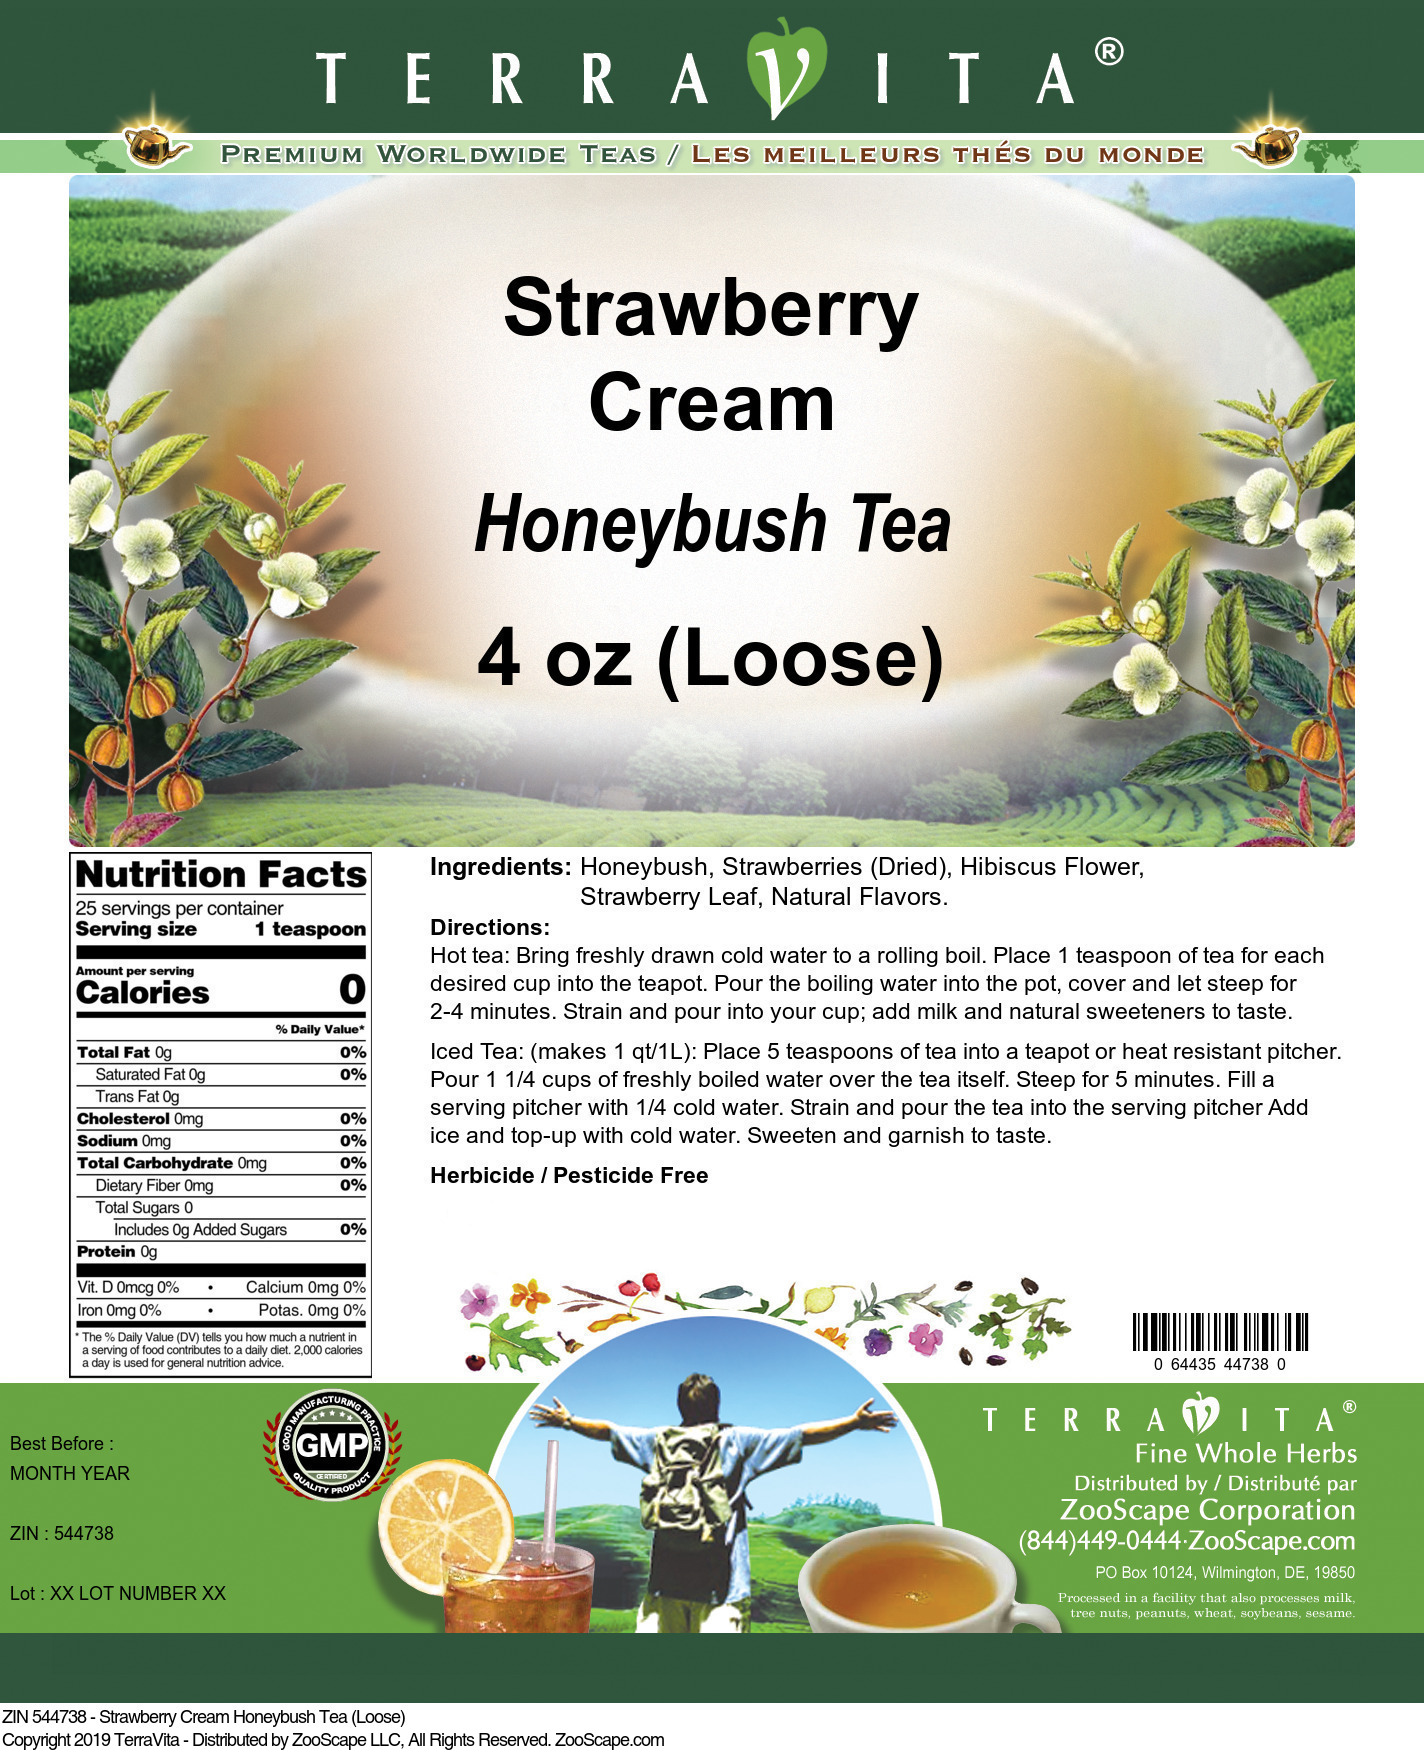 Strawberry Cream Honeybush Tea